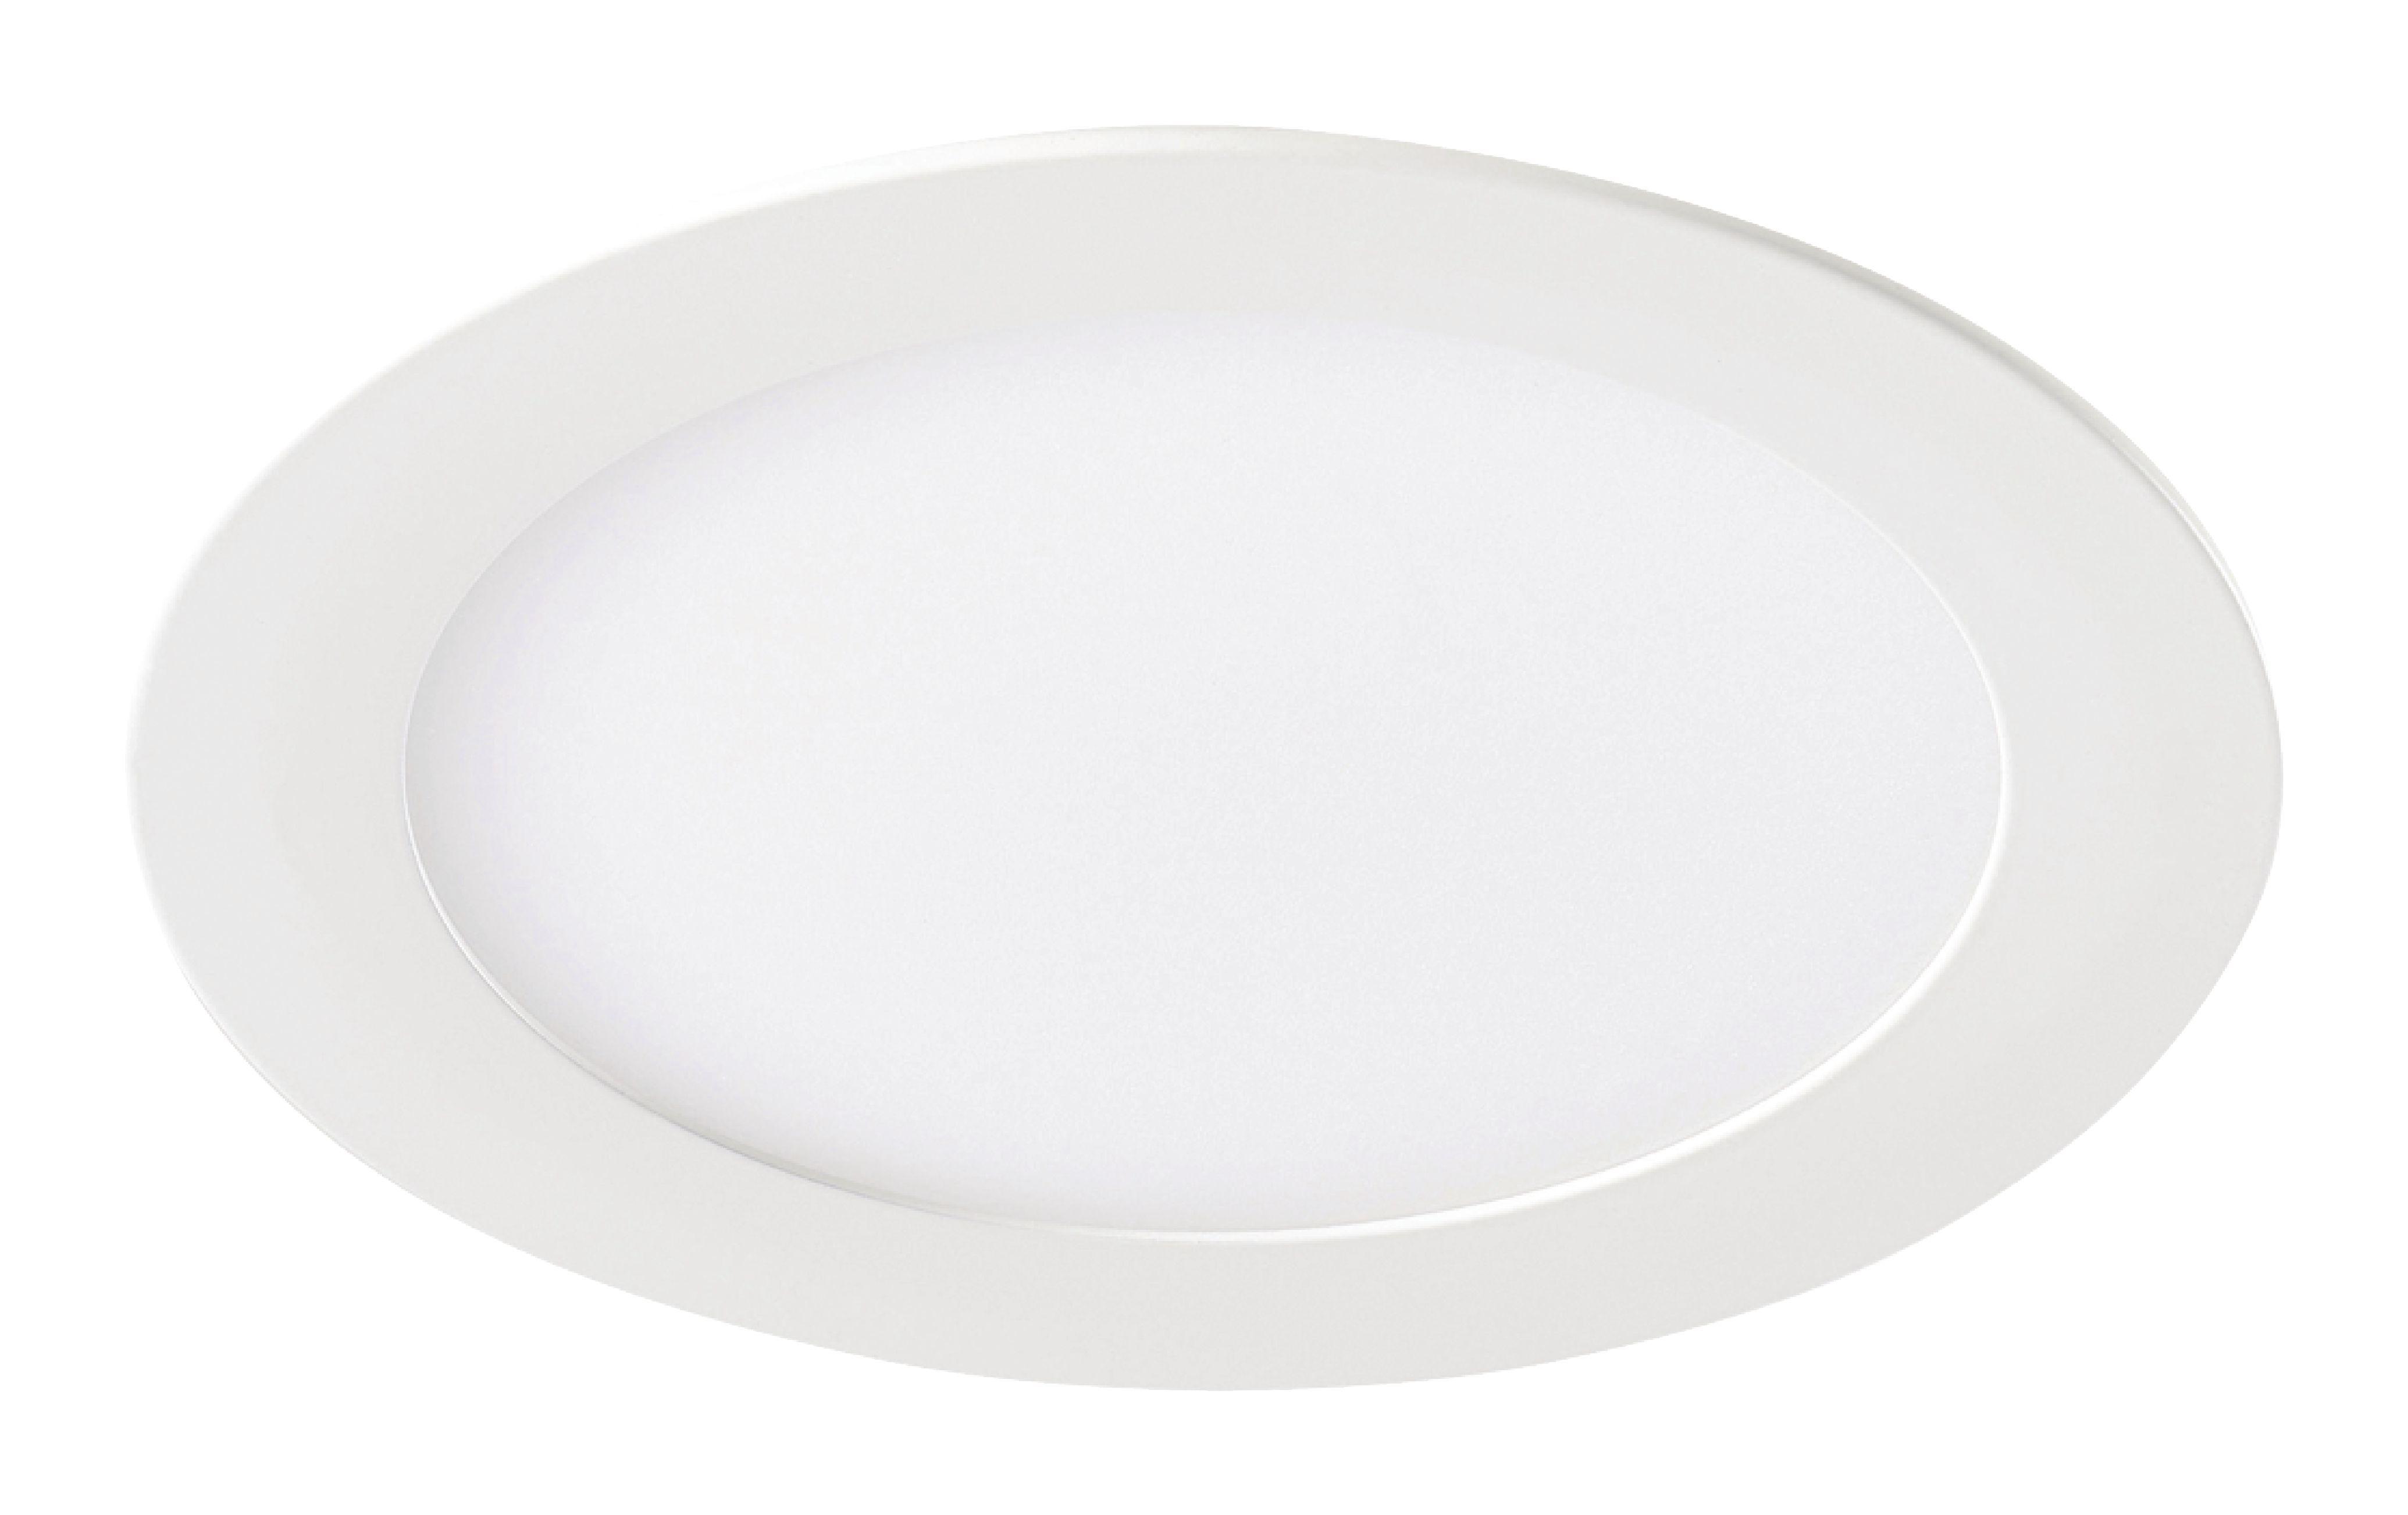 LED-Einbauleuchte 25 W 3000 K 2000 lm